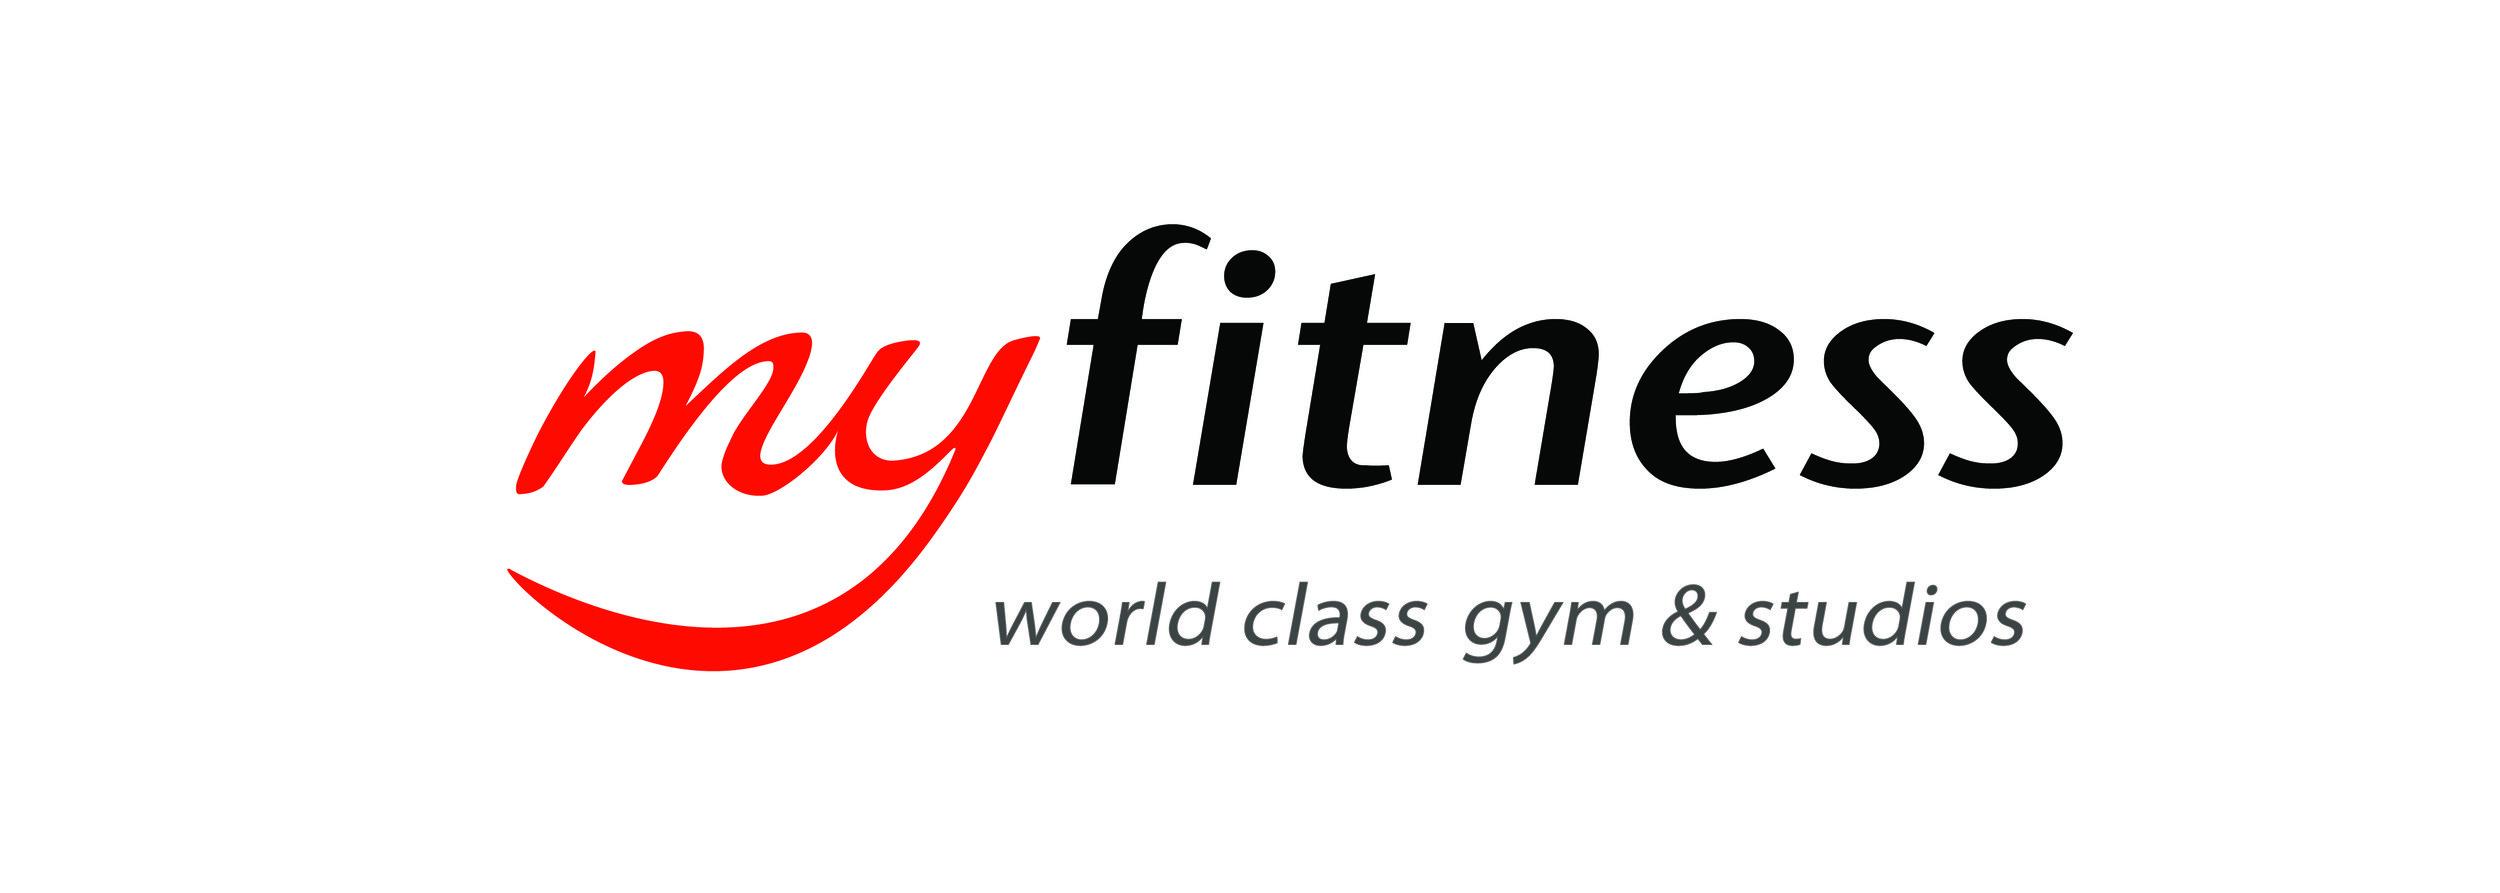 Myfitness_logo.jpg